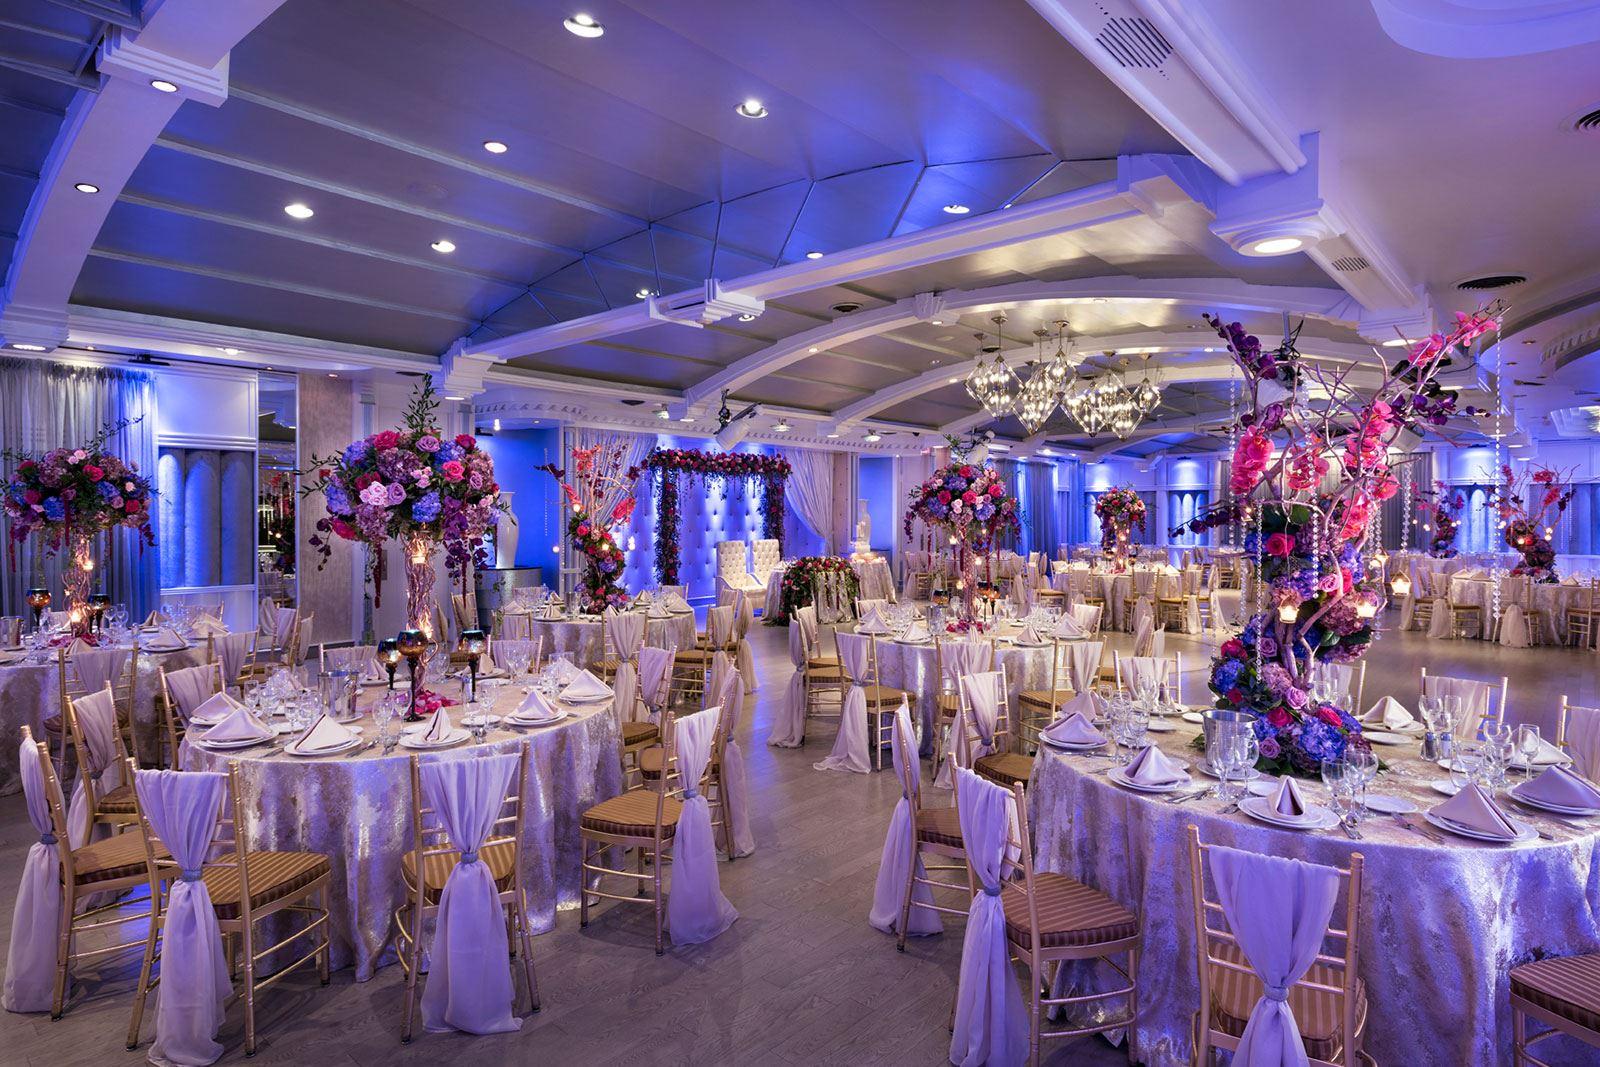 Chateau Briand Ballroom Tables